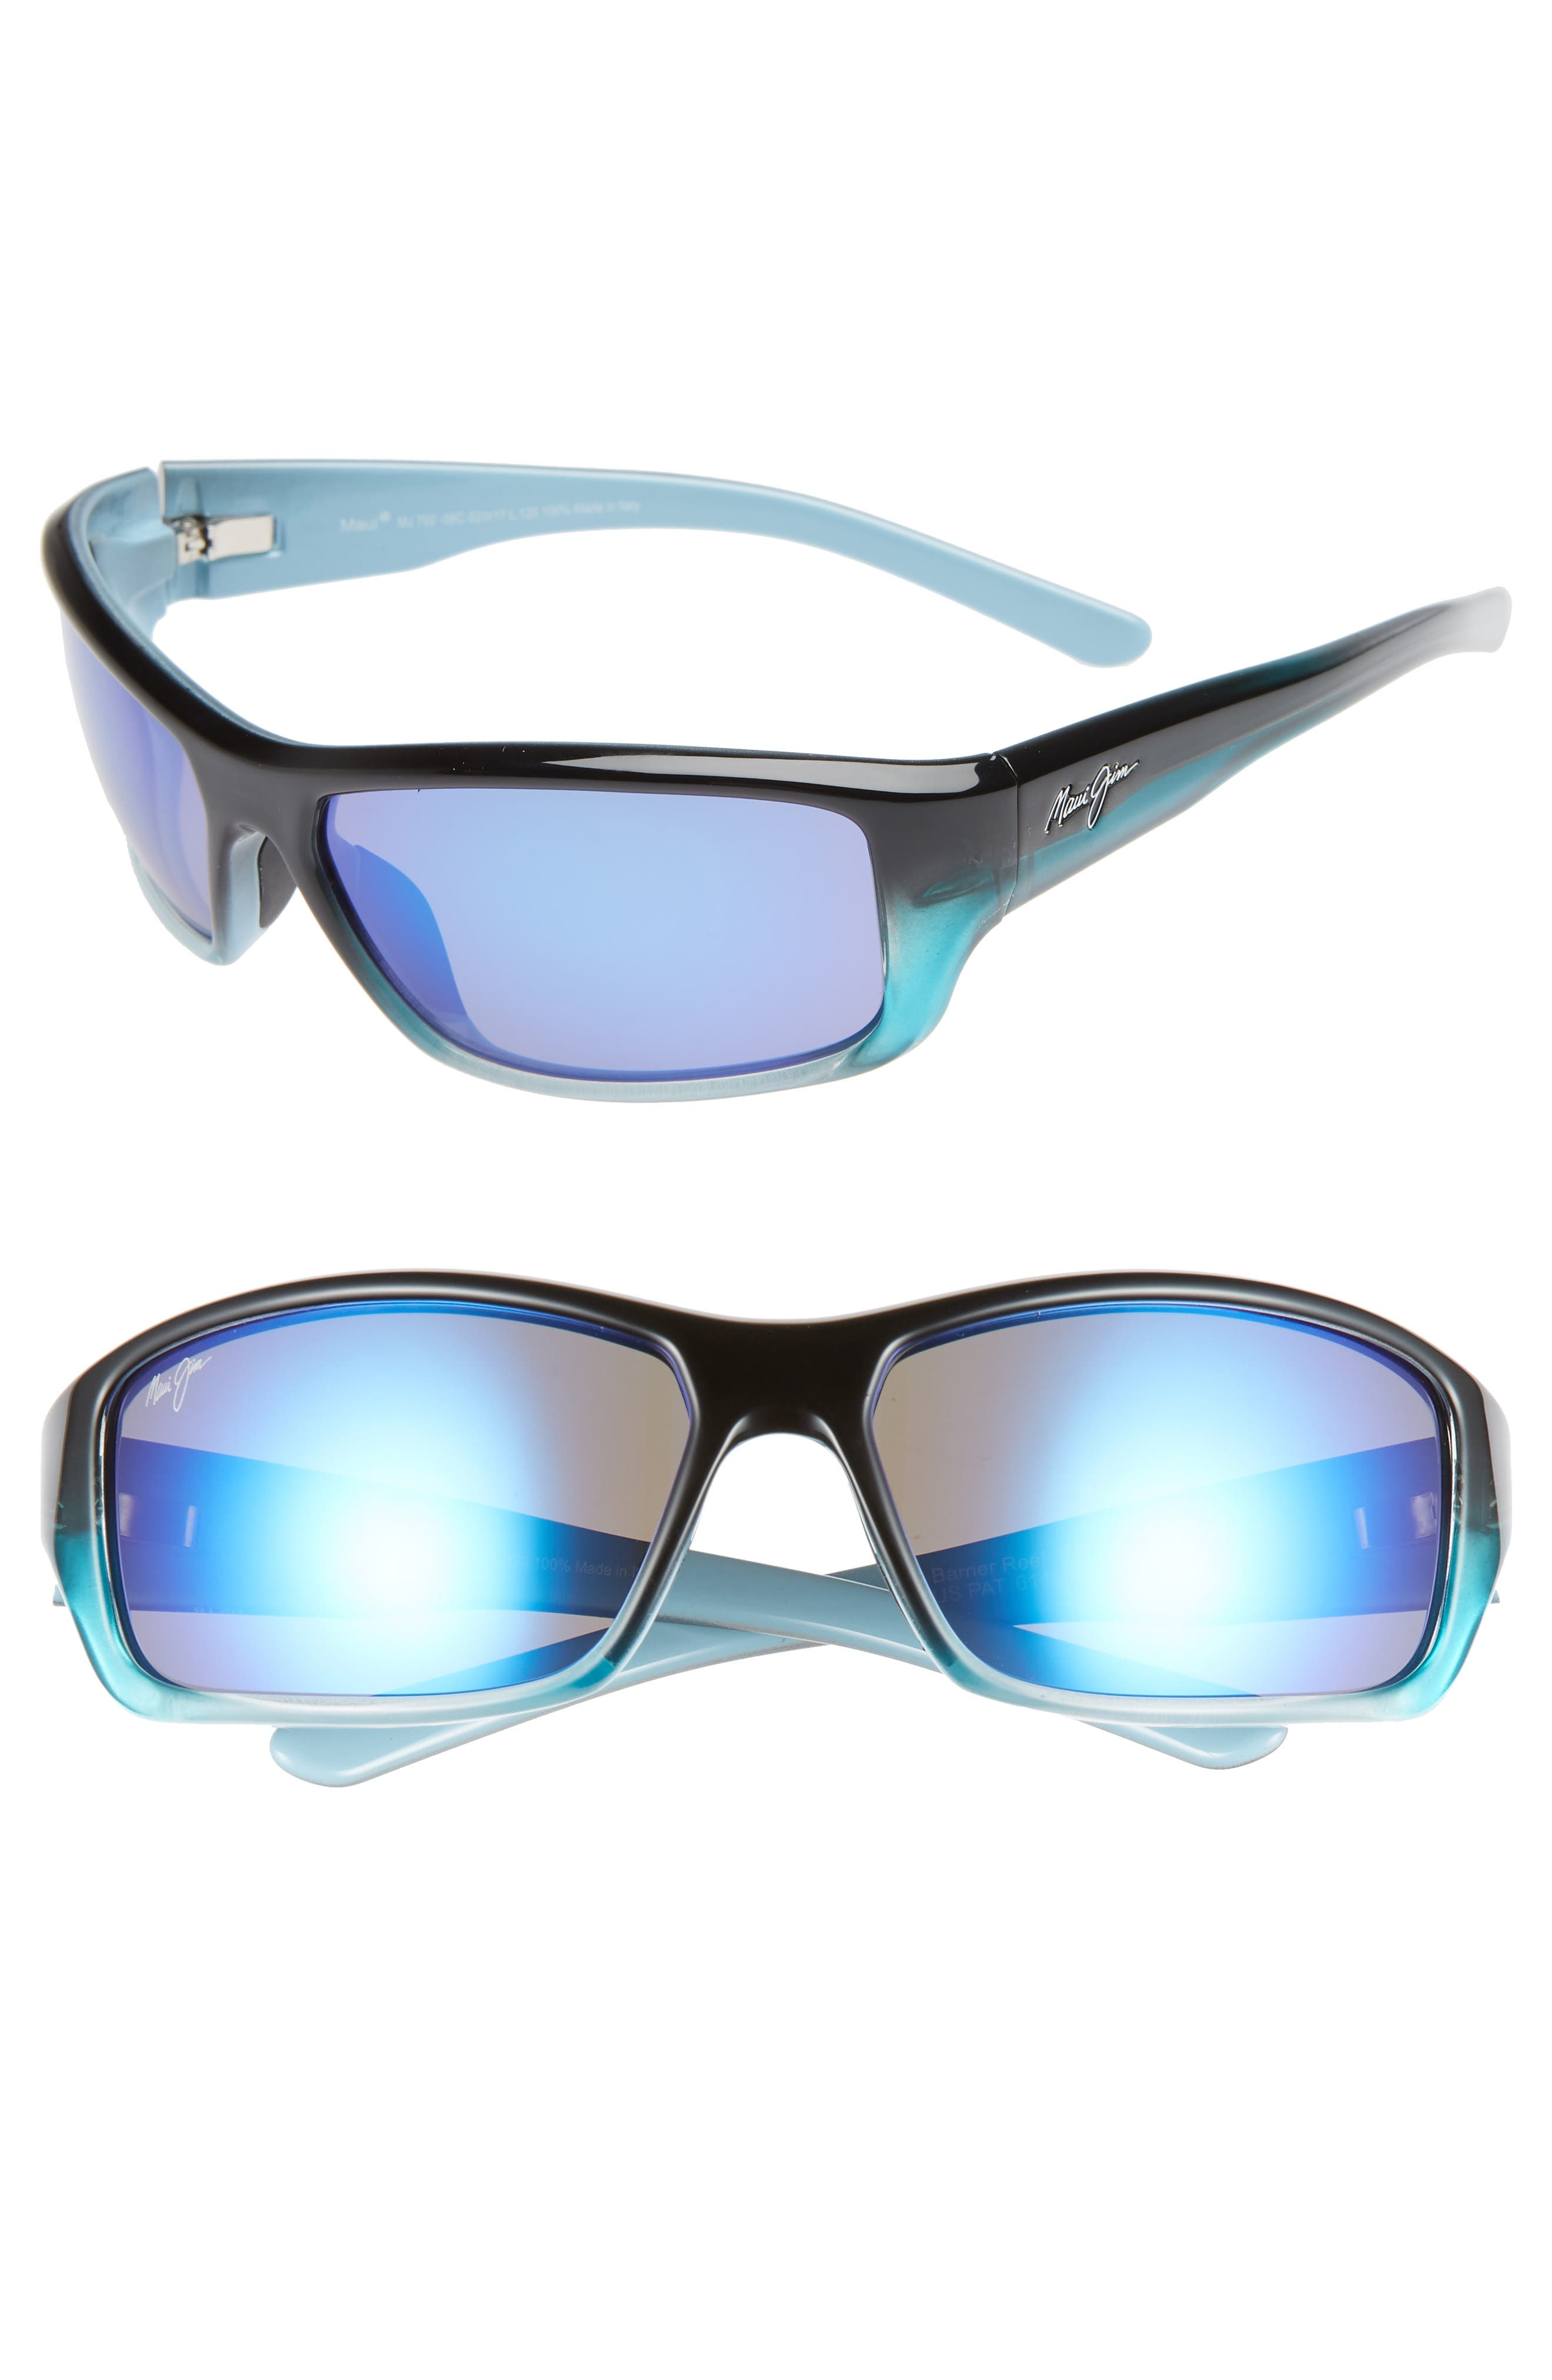 Maui Jim Barrier Reef 62Mm Polarizedplus2 Sunglasses - Blue Turquoise/ Blue